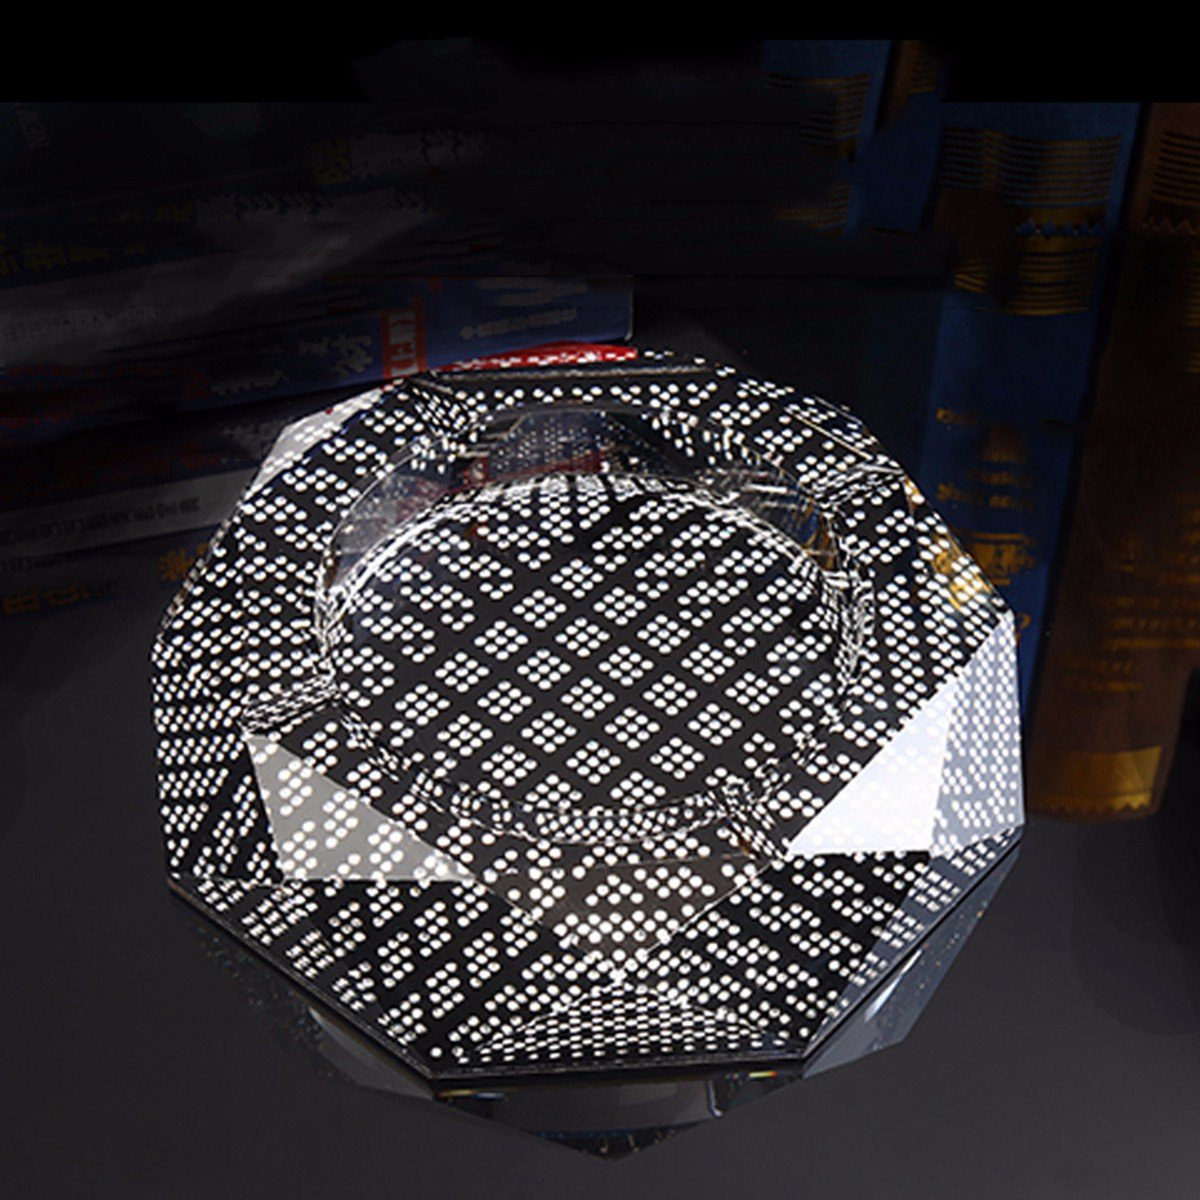 QPGGP-ashtray Home furnishing diamond crystal ashtray creative and practical European large air gift ashtray,25cm